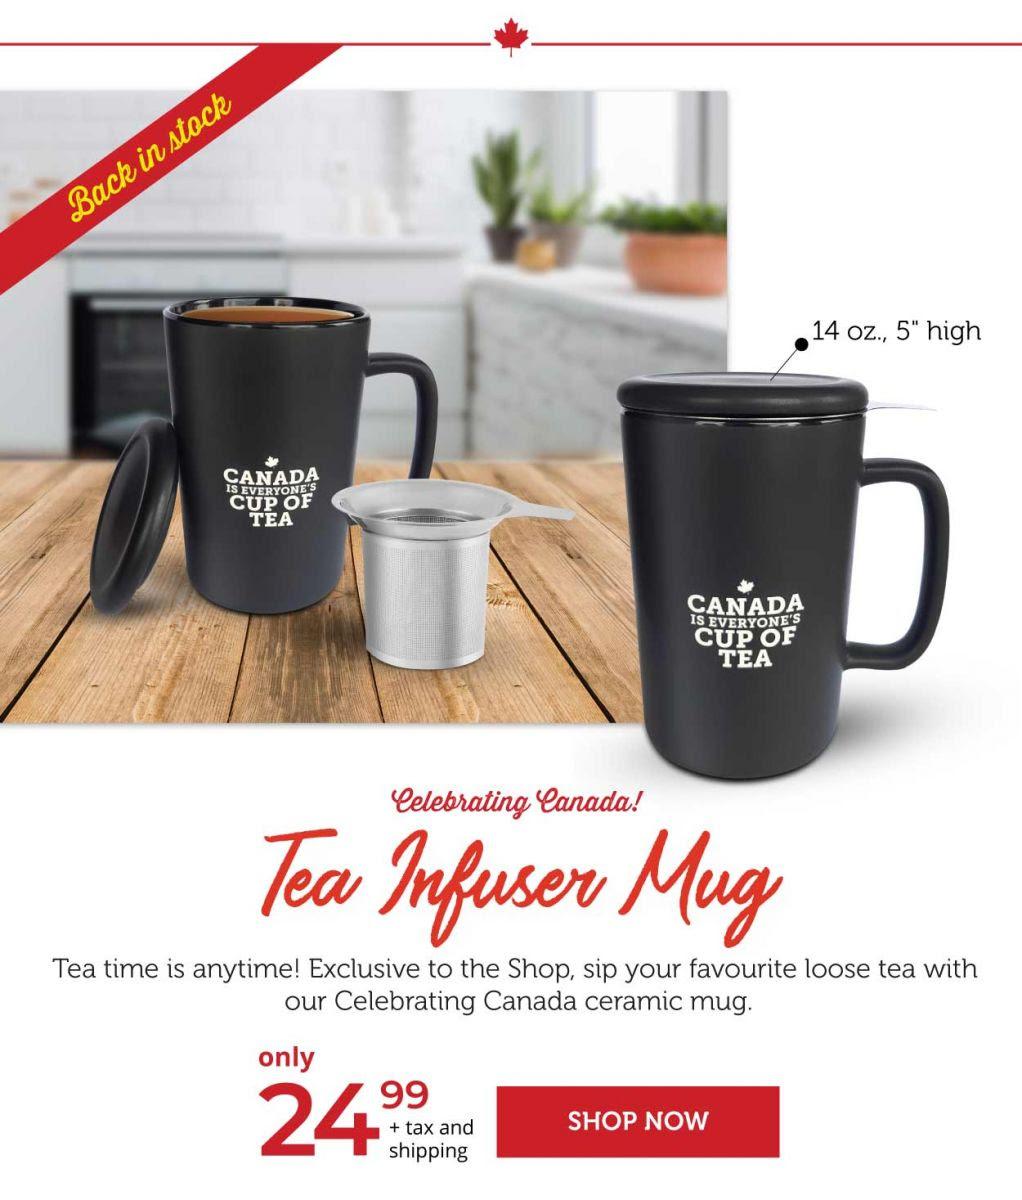 Tea Infuser Mugs